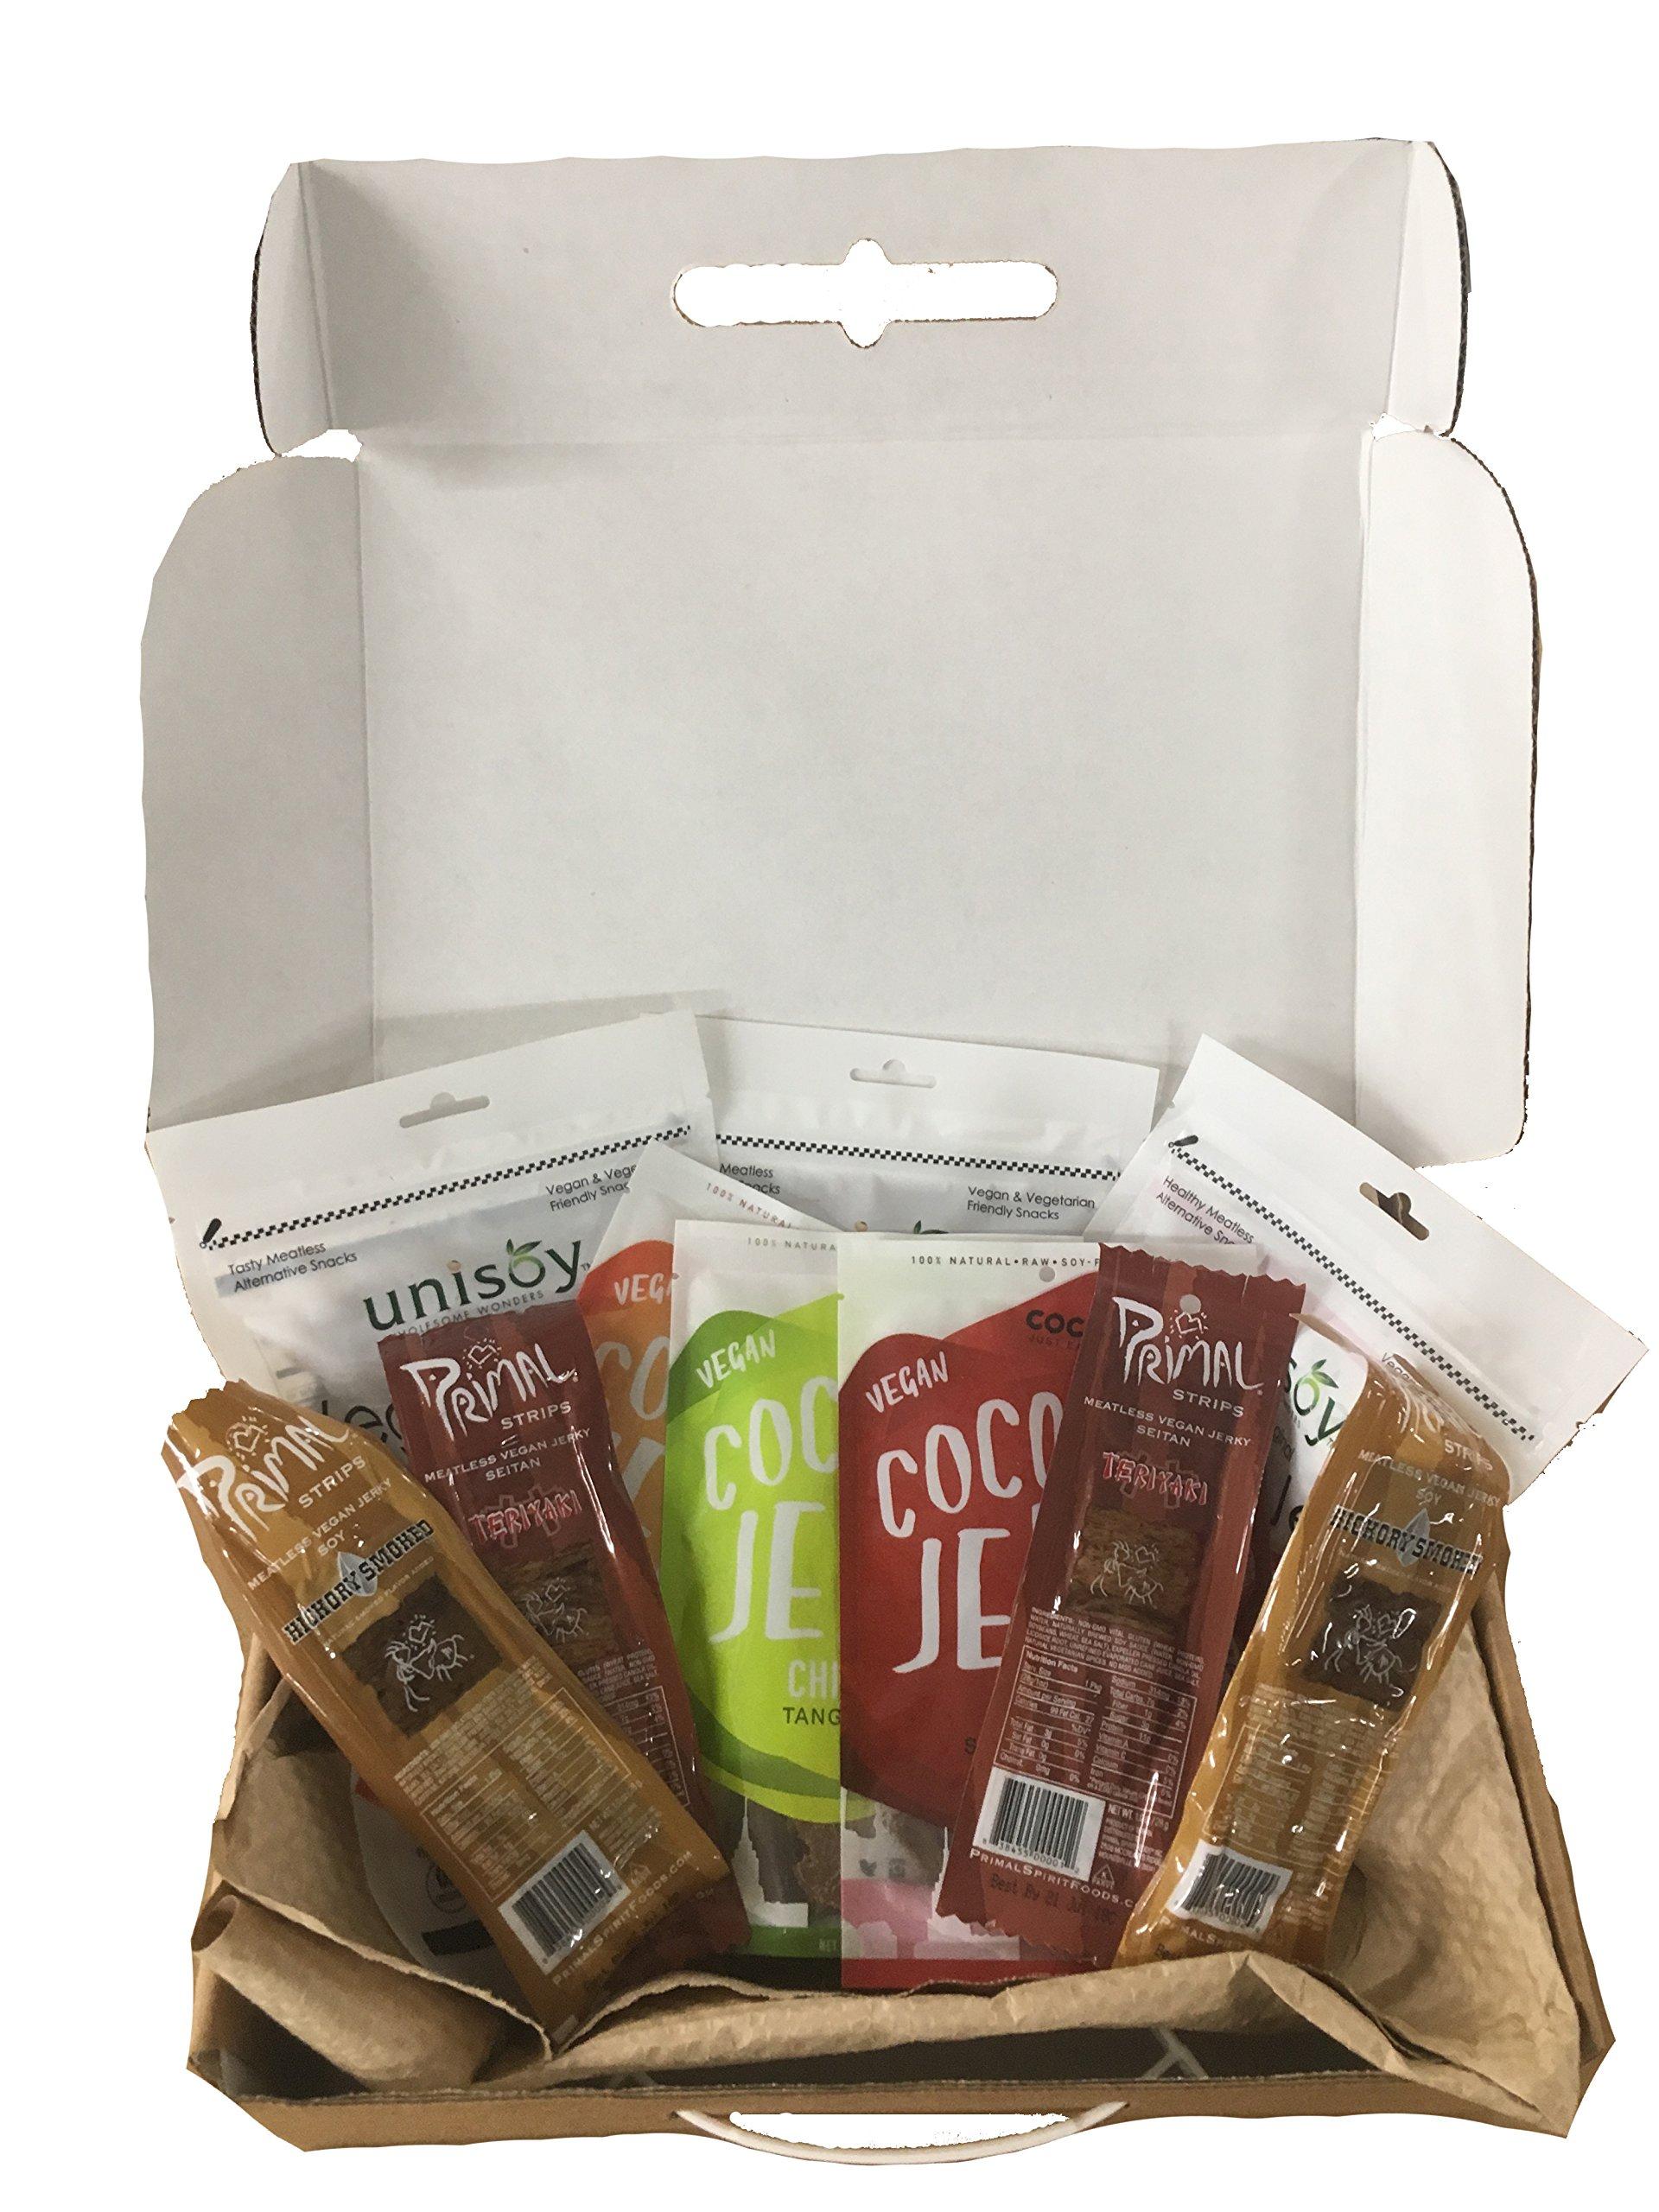 Vegan Jerky Sampler Gift Box by Newport Jerky Company